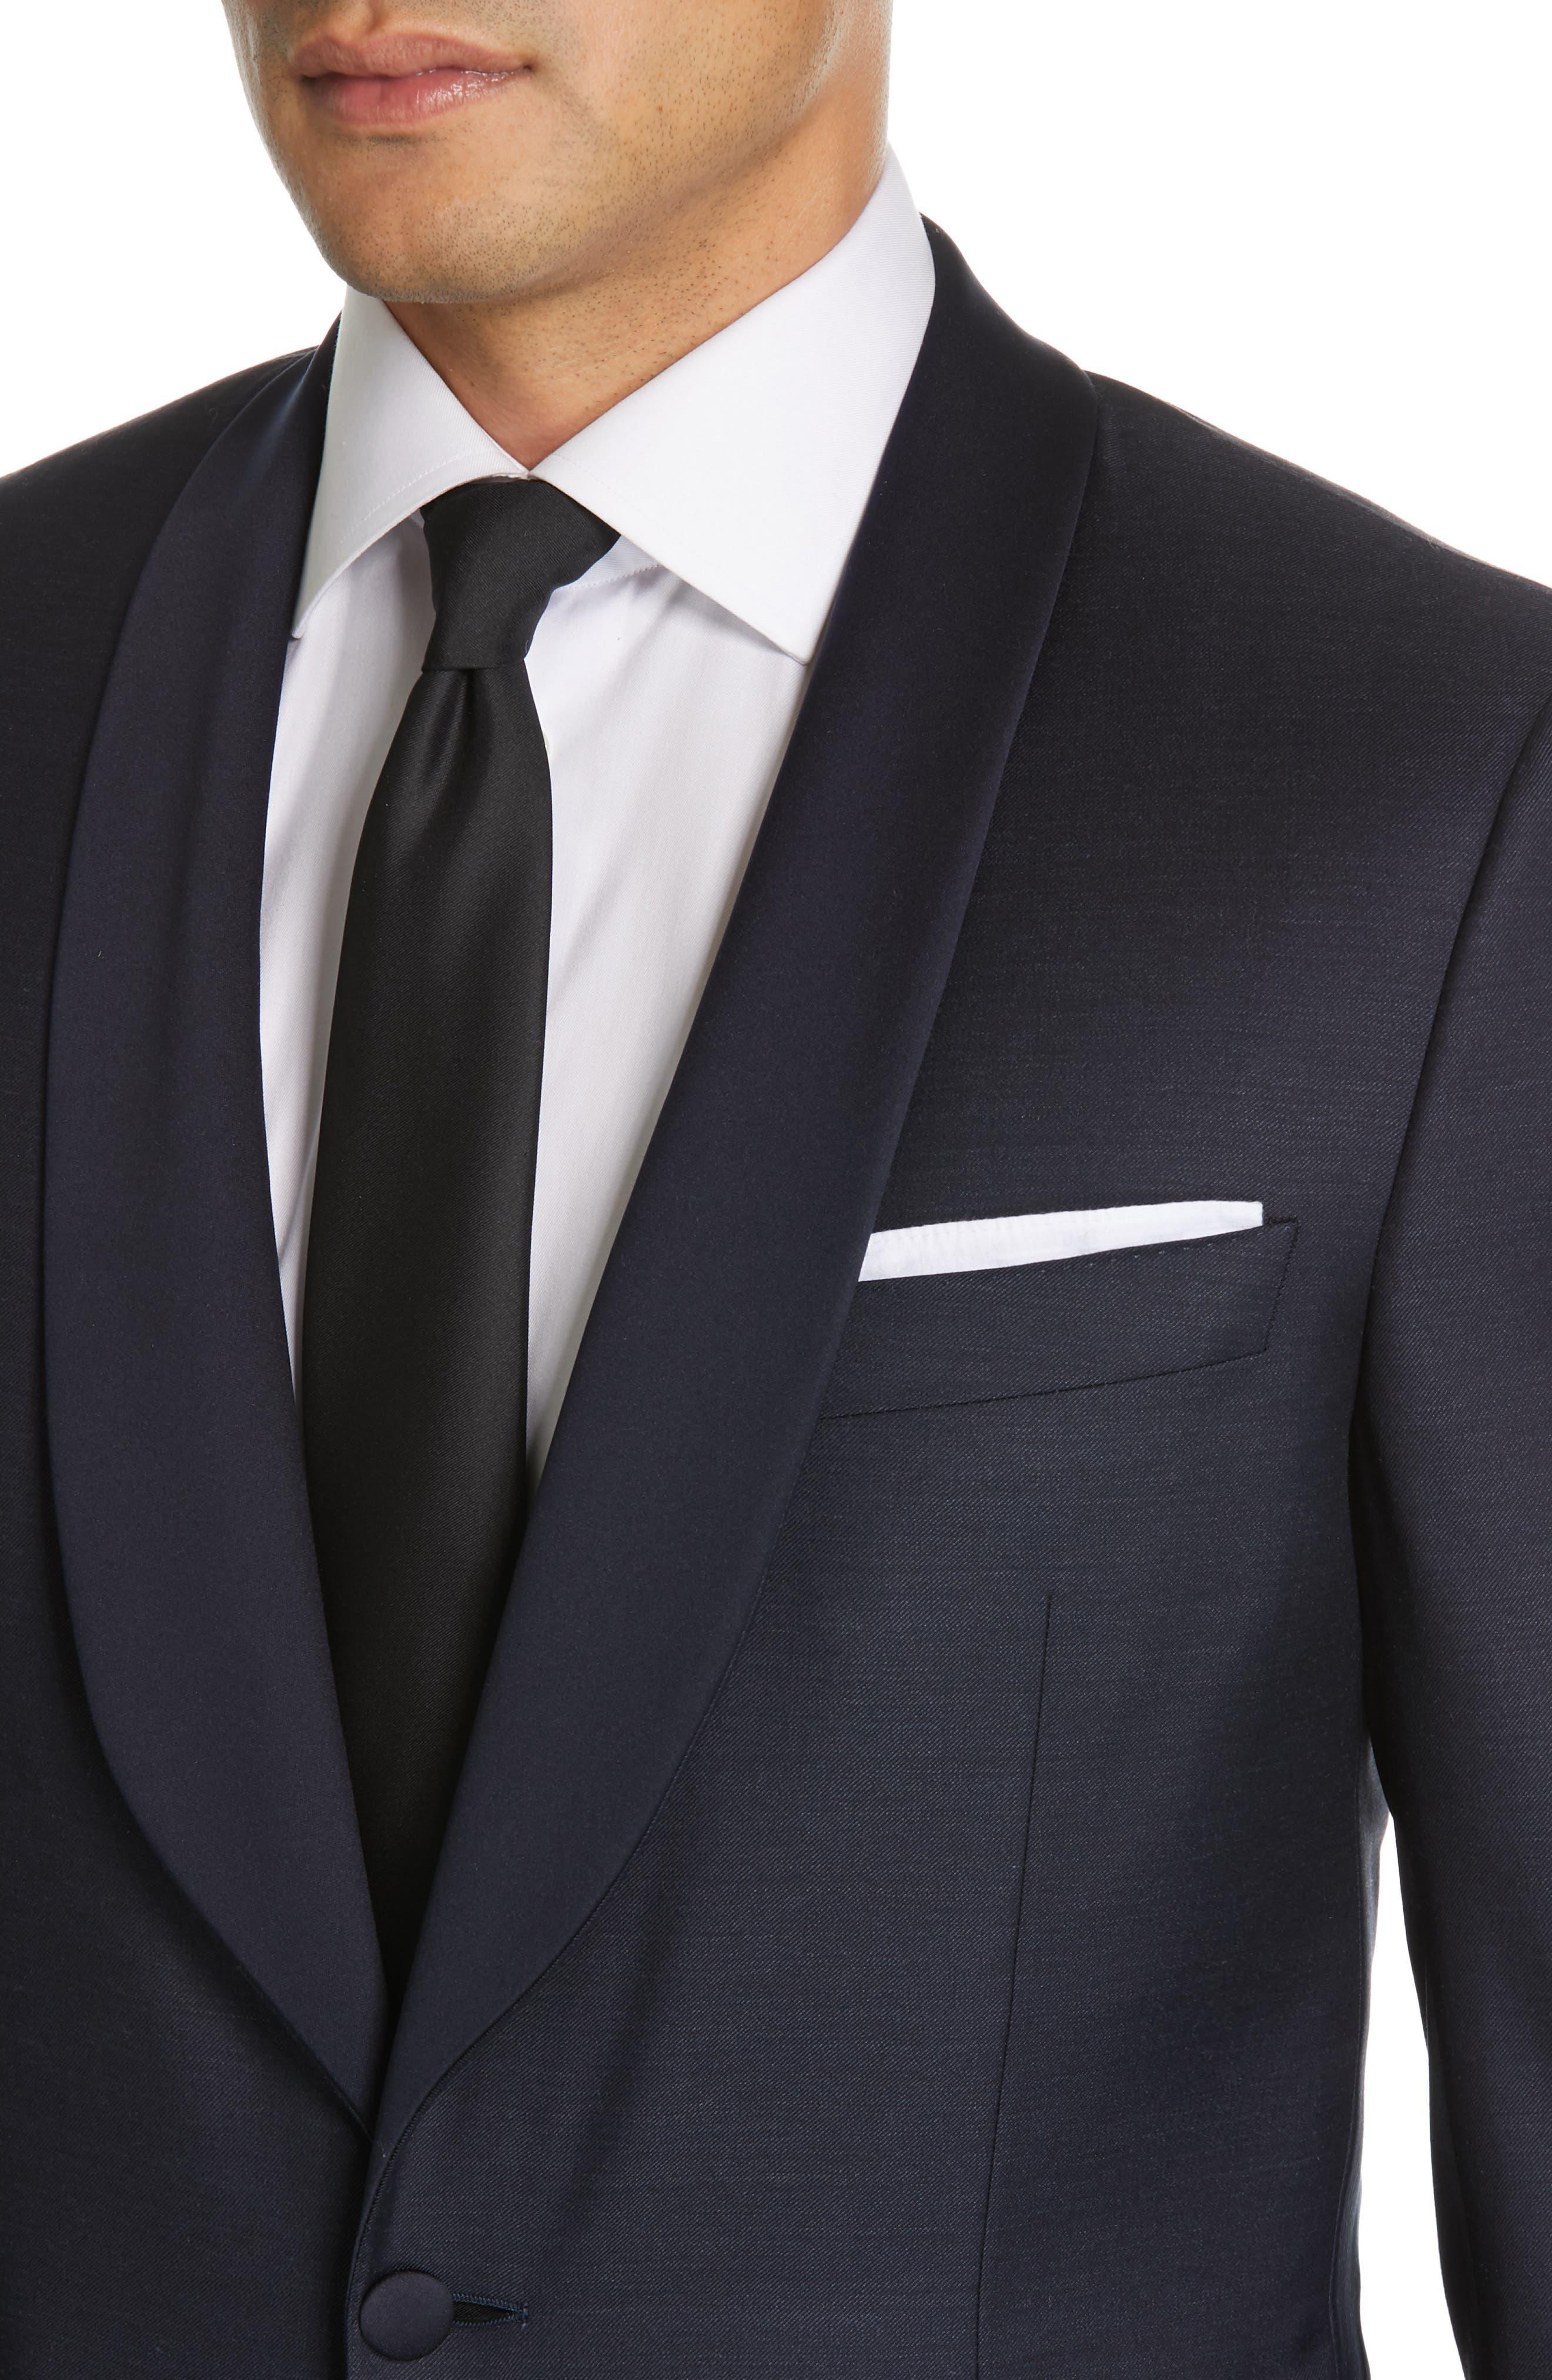 CANALI, Venieza Classic Fit Wool Tuxedo, Alternate thumbnail 4, color, NAVY